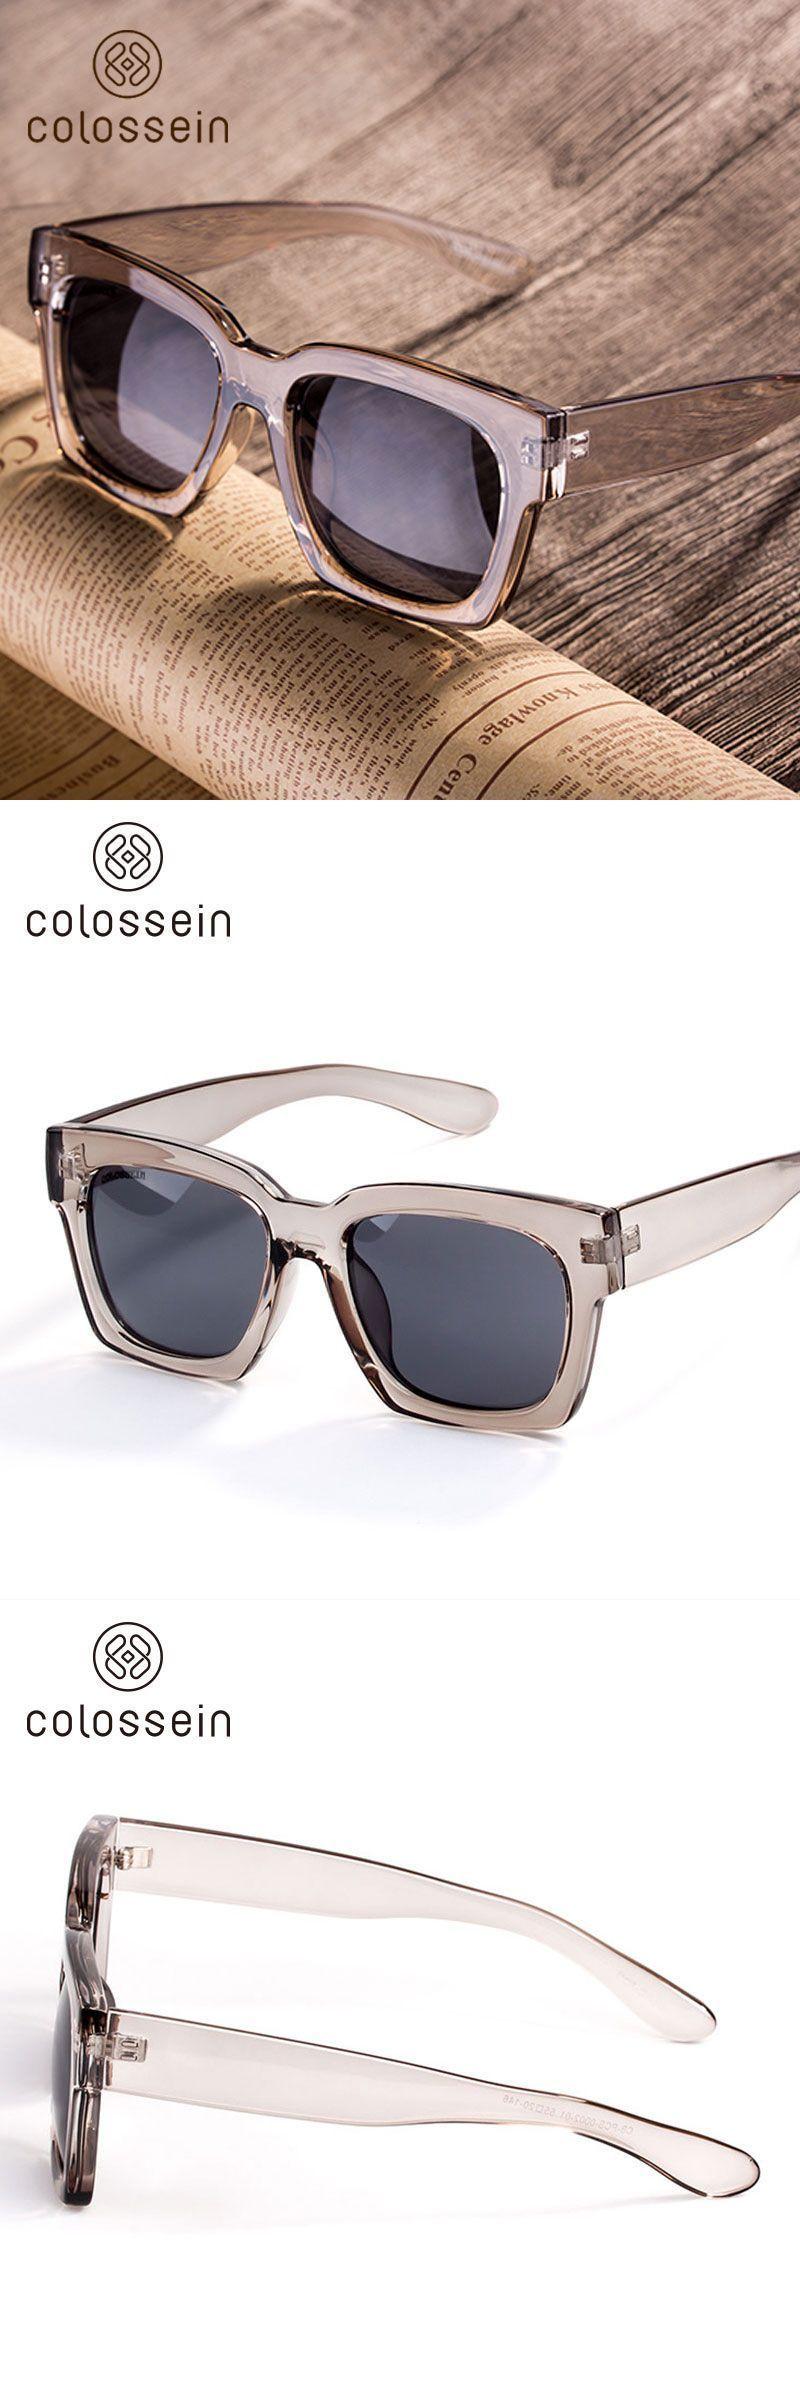 440b1679aa4012 Fashion Sunglasses Women Loves Oversized Square Frame Eyewear 2018 New  Trendy Summer Glasses New Trend for